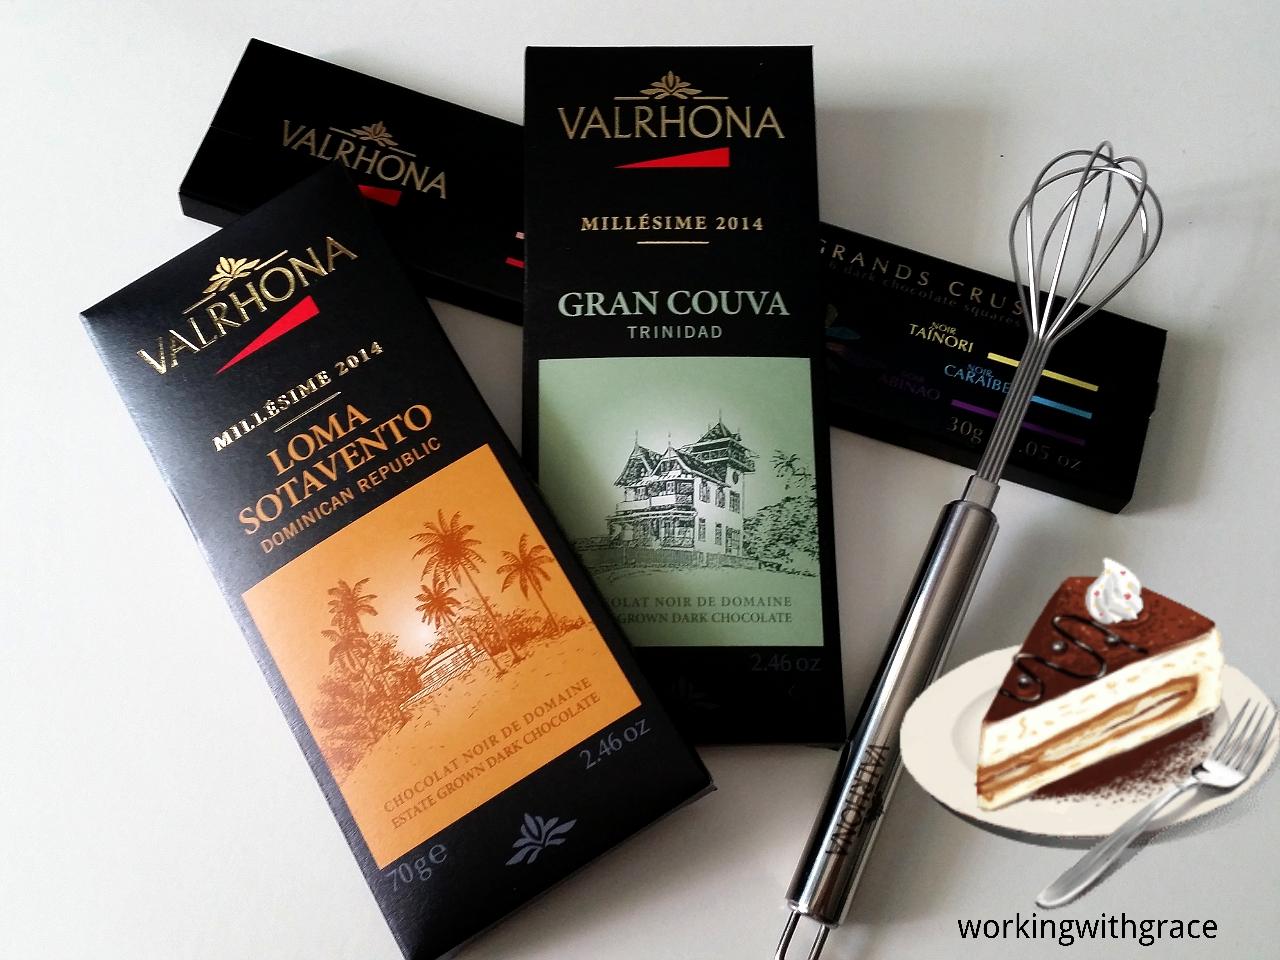 valrhona chocolate | Working With Grace